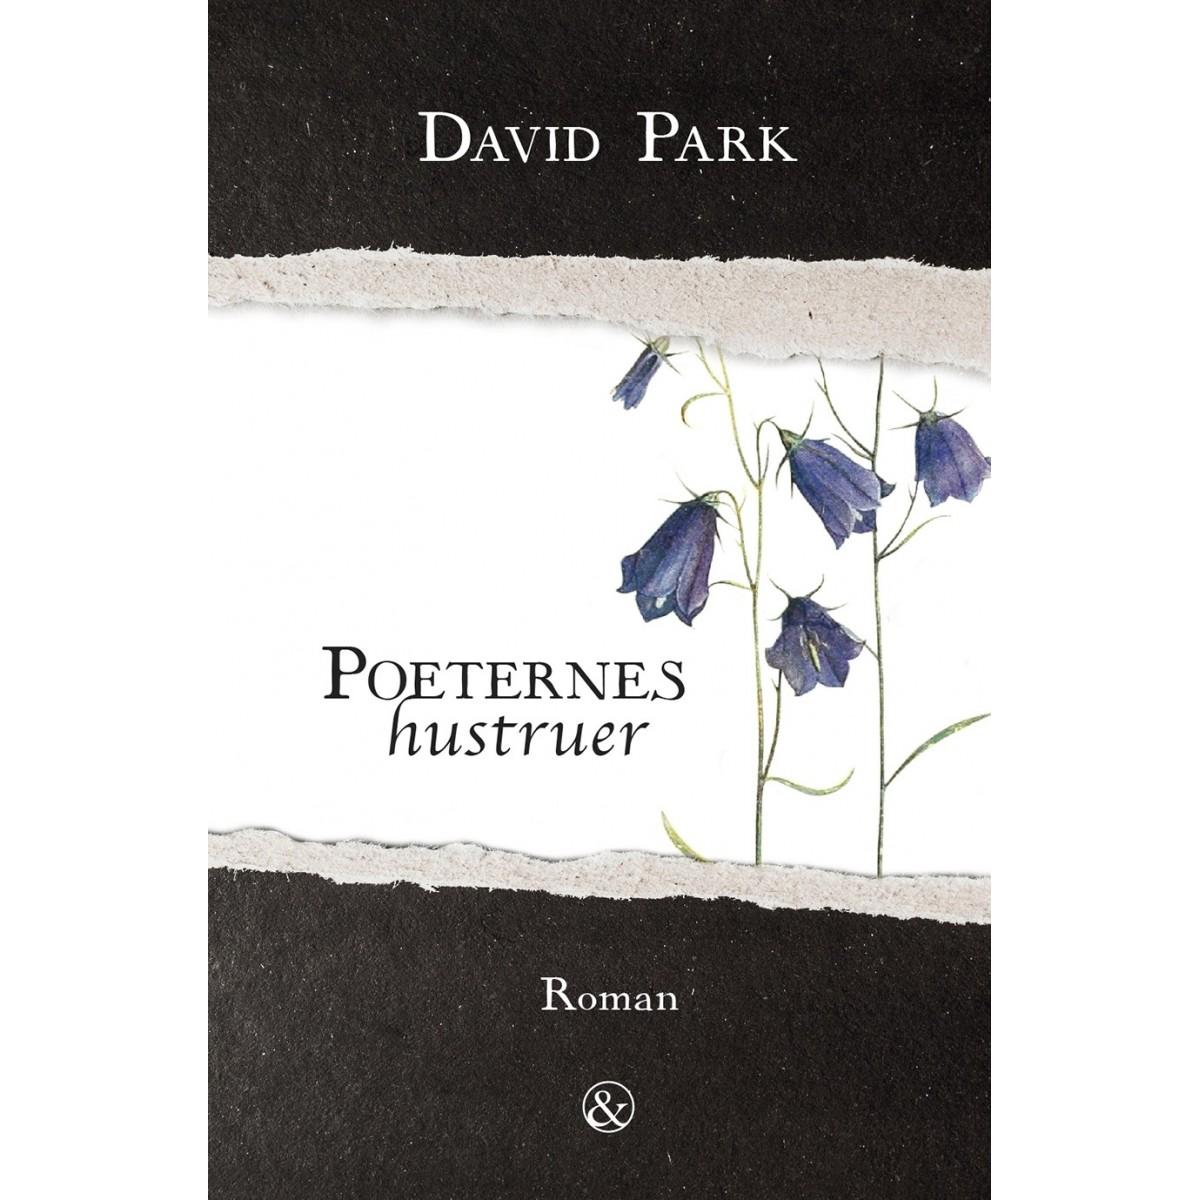 David Park: Poeternes hustruer